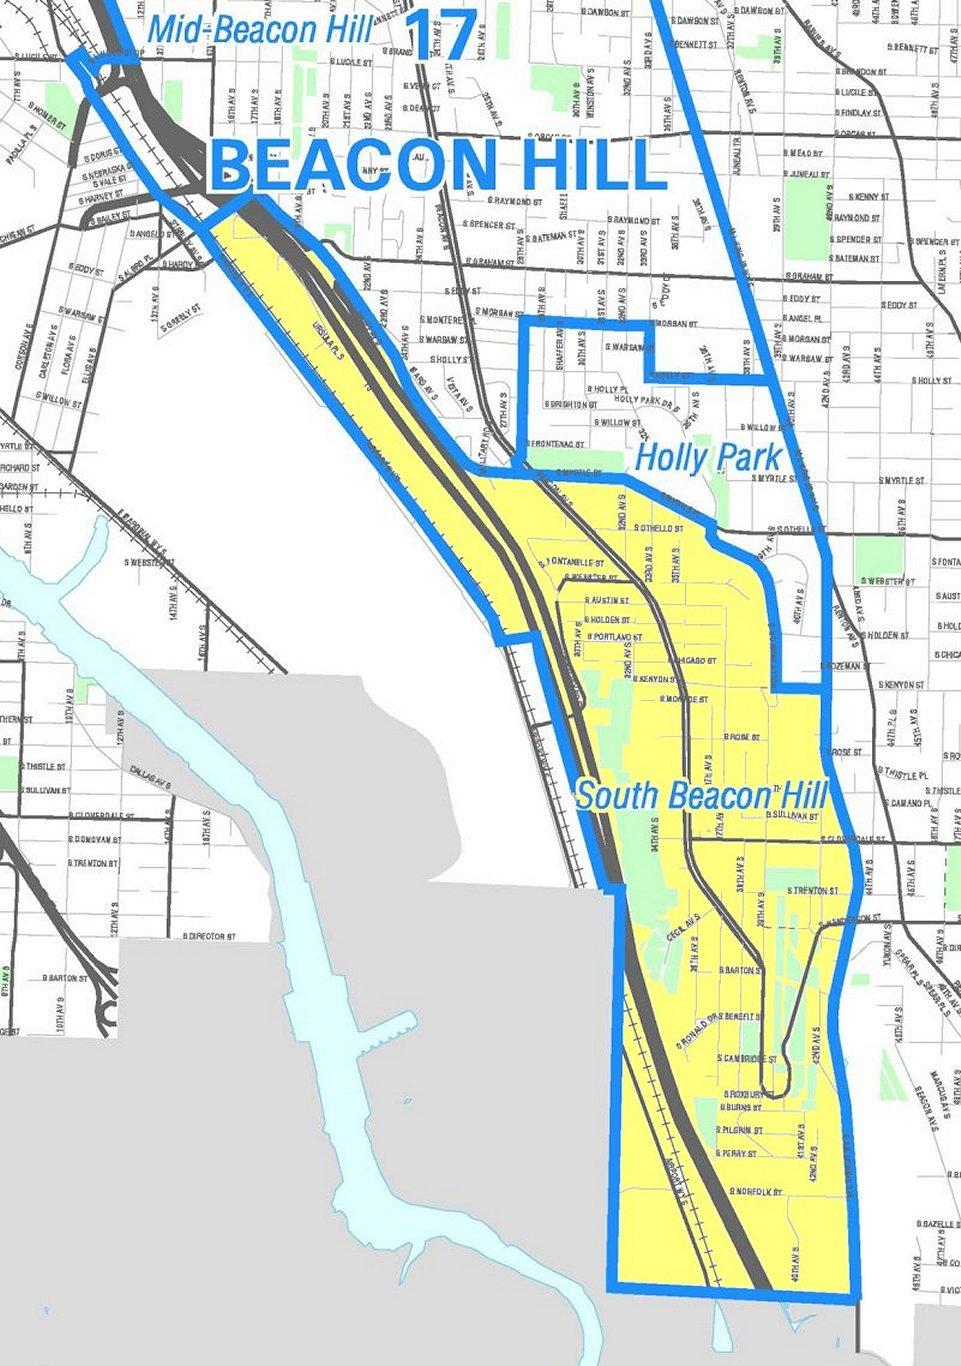 fileseattle  south beacon hill map. fileseattle  south beacon hill map  wikimedia commons